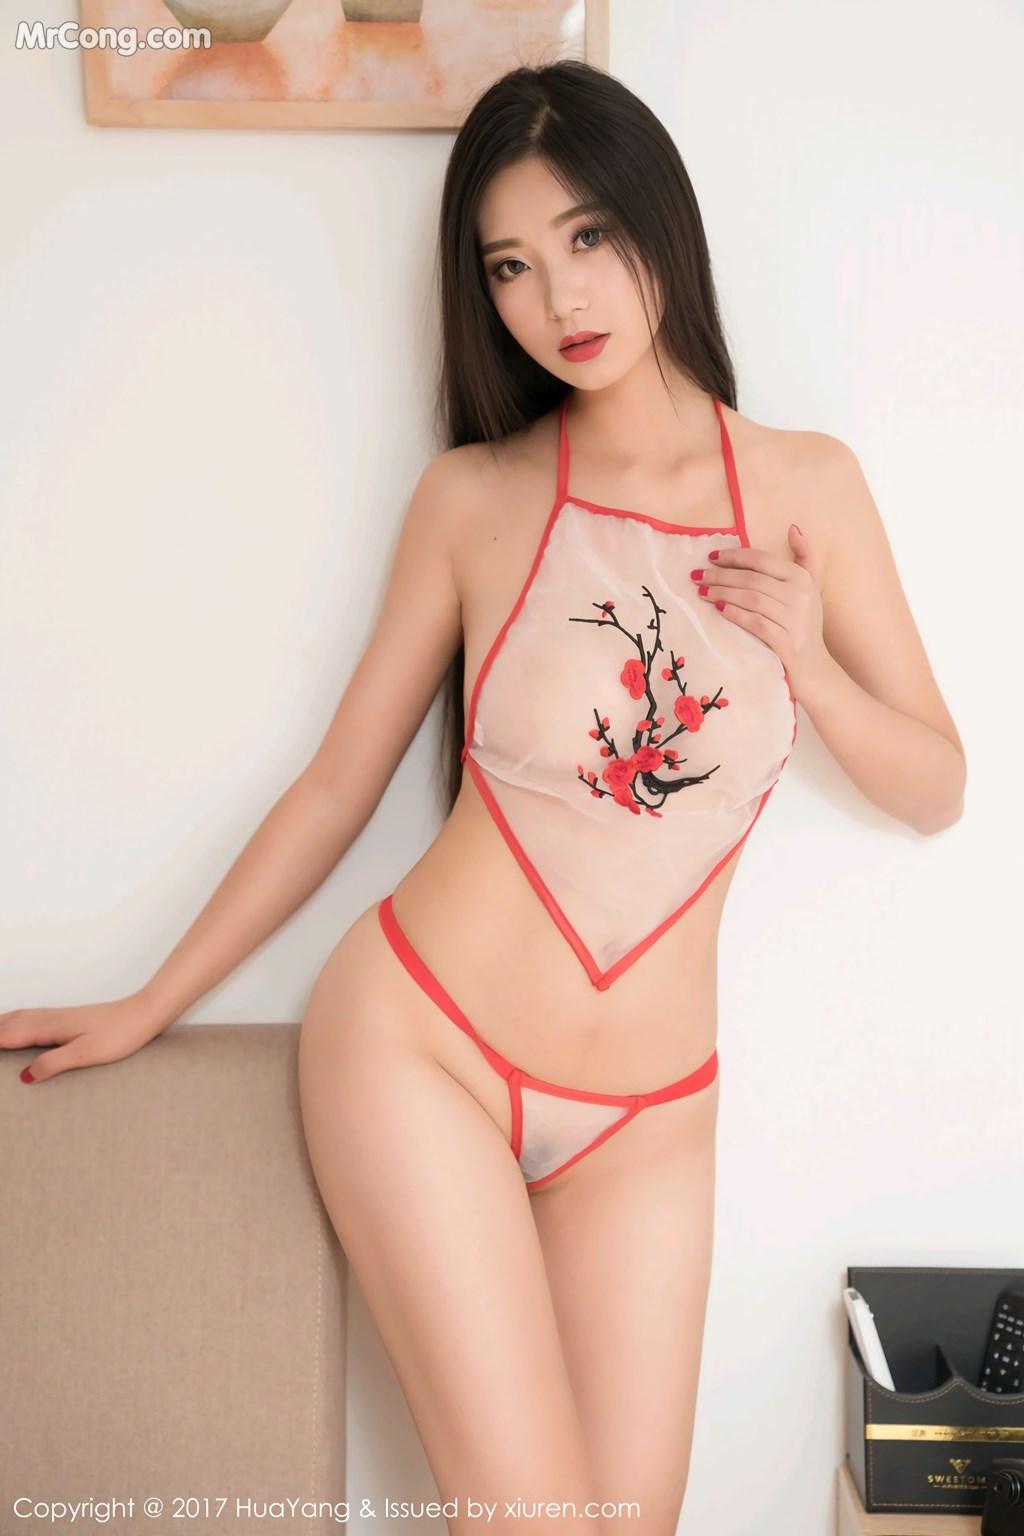 Image HuaYang-2017-11-10-Vol.015-KiKi-MrCong.com-011 in post HuaYang 2017-11-10 Vol.015: Người mẫu 宋-KiKi (45 ảnh)